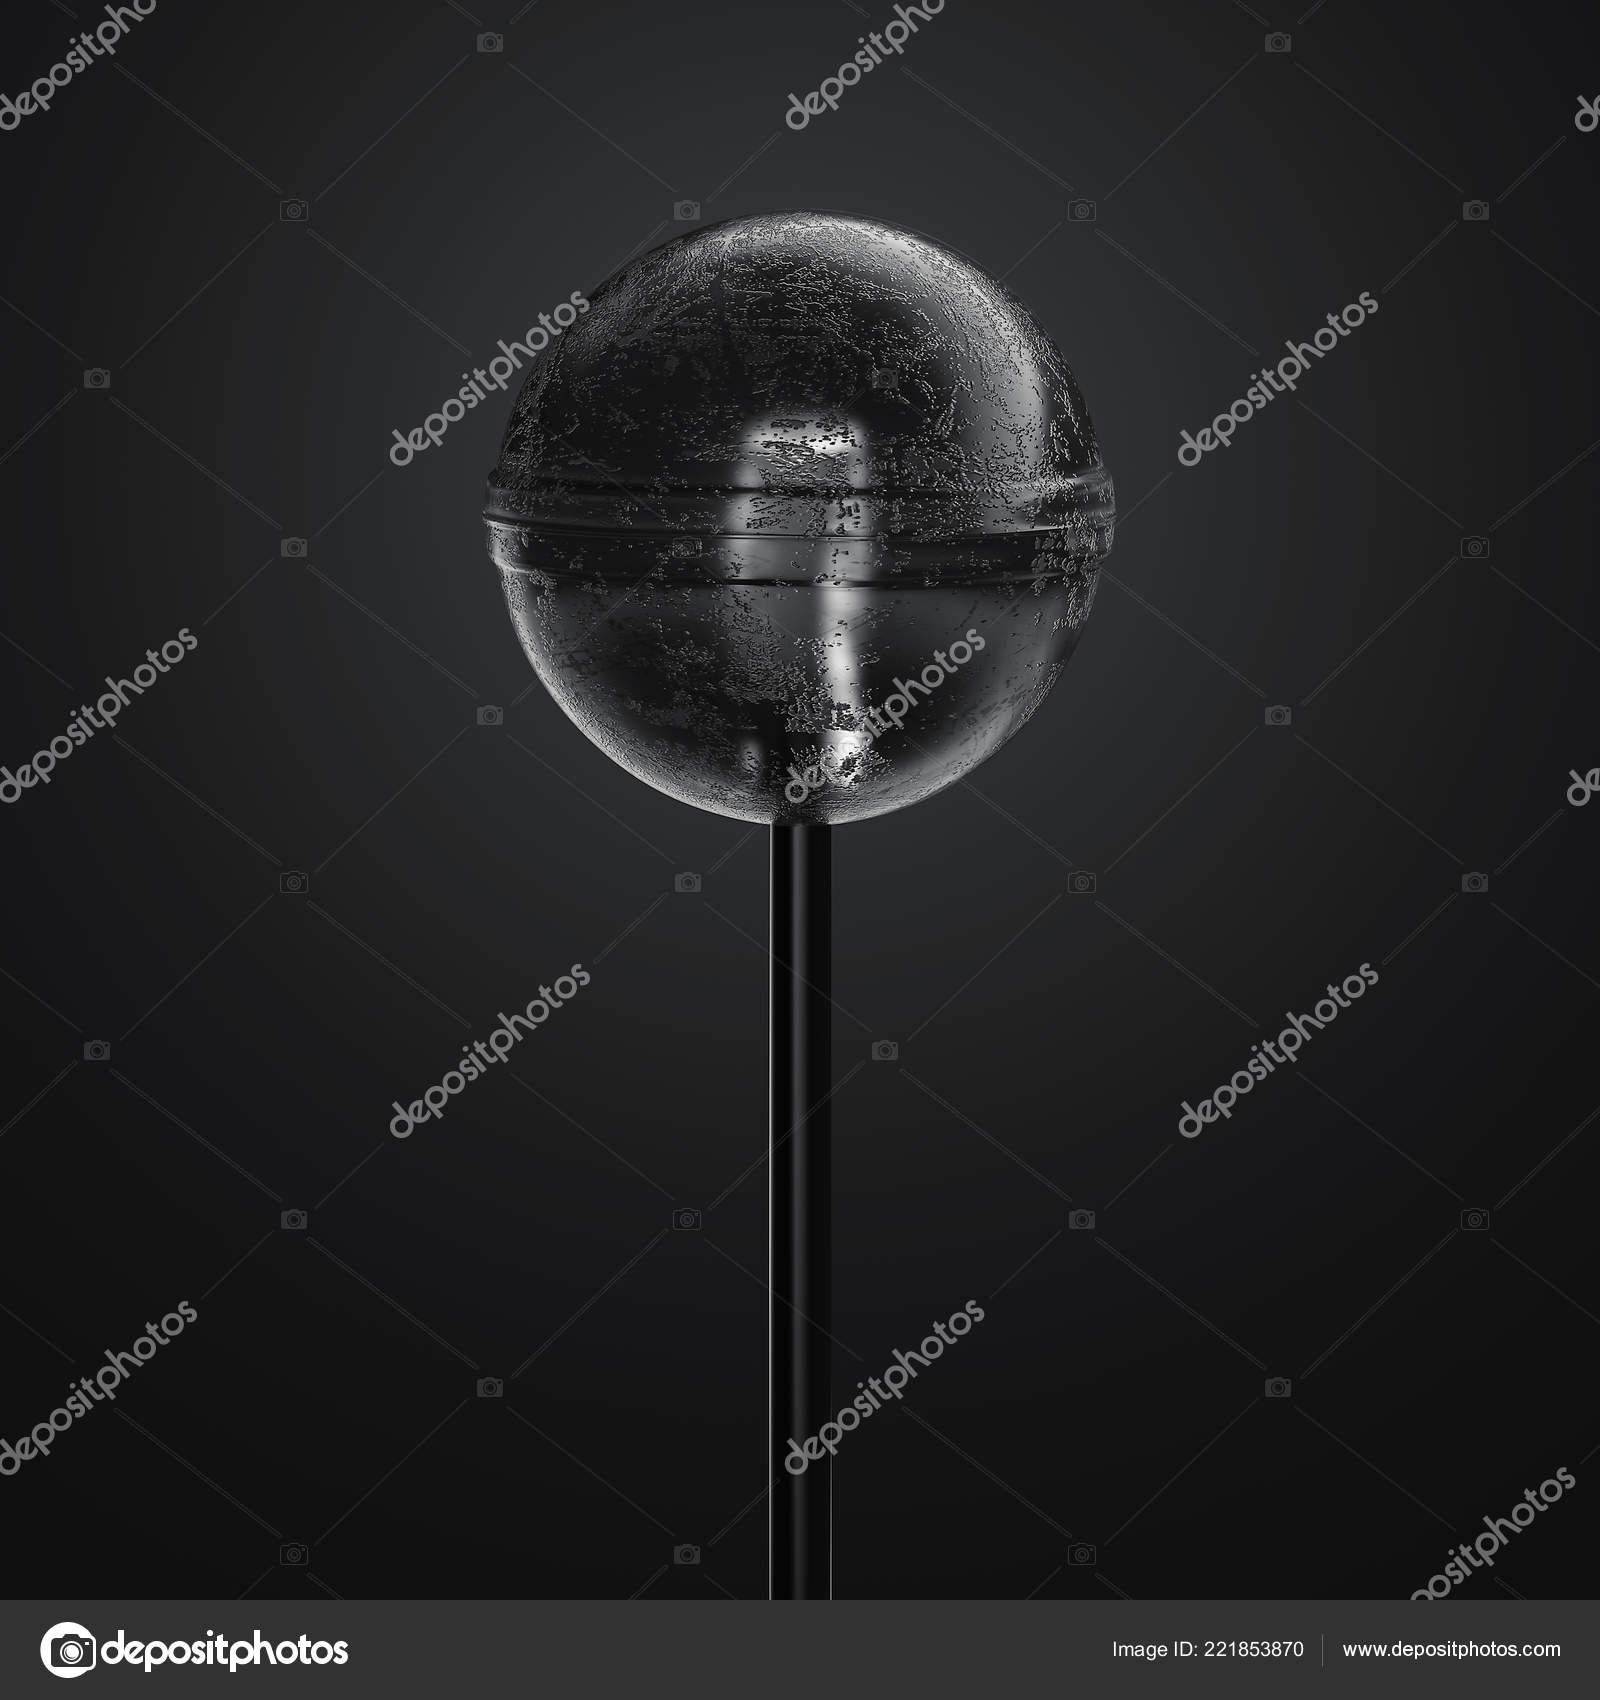 Black Realistic Transparent Lollipop On Black Background 3d